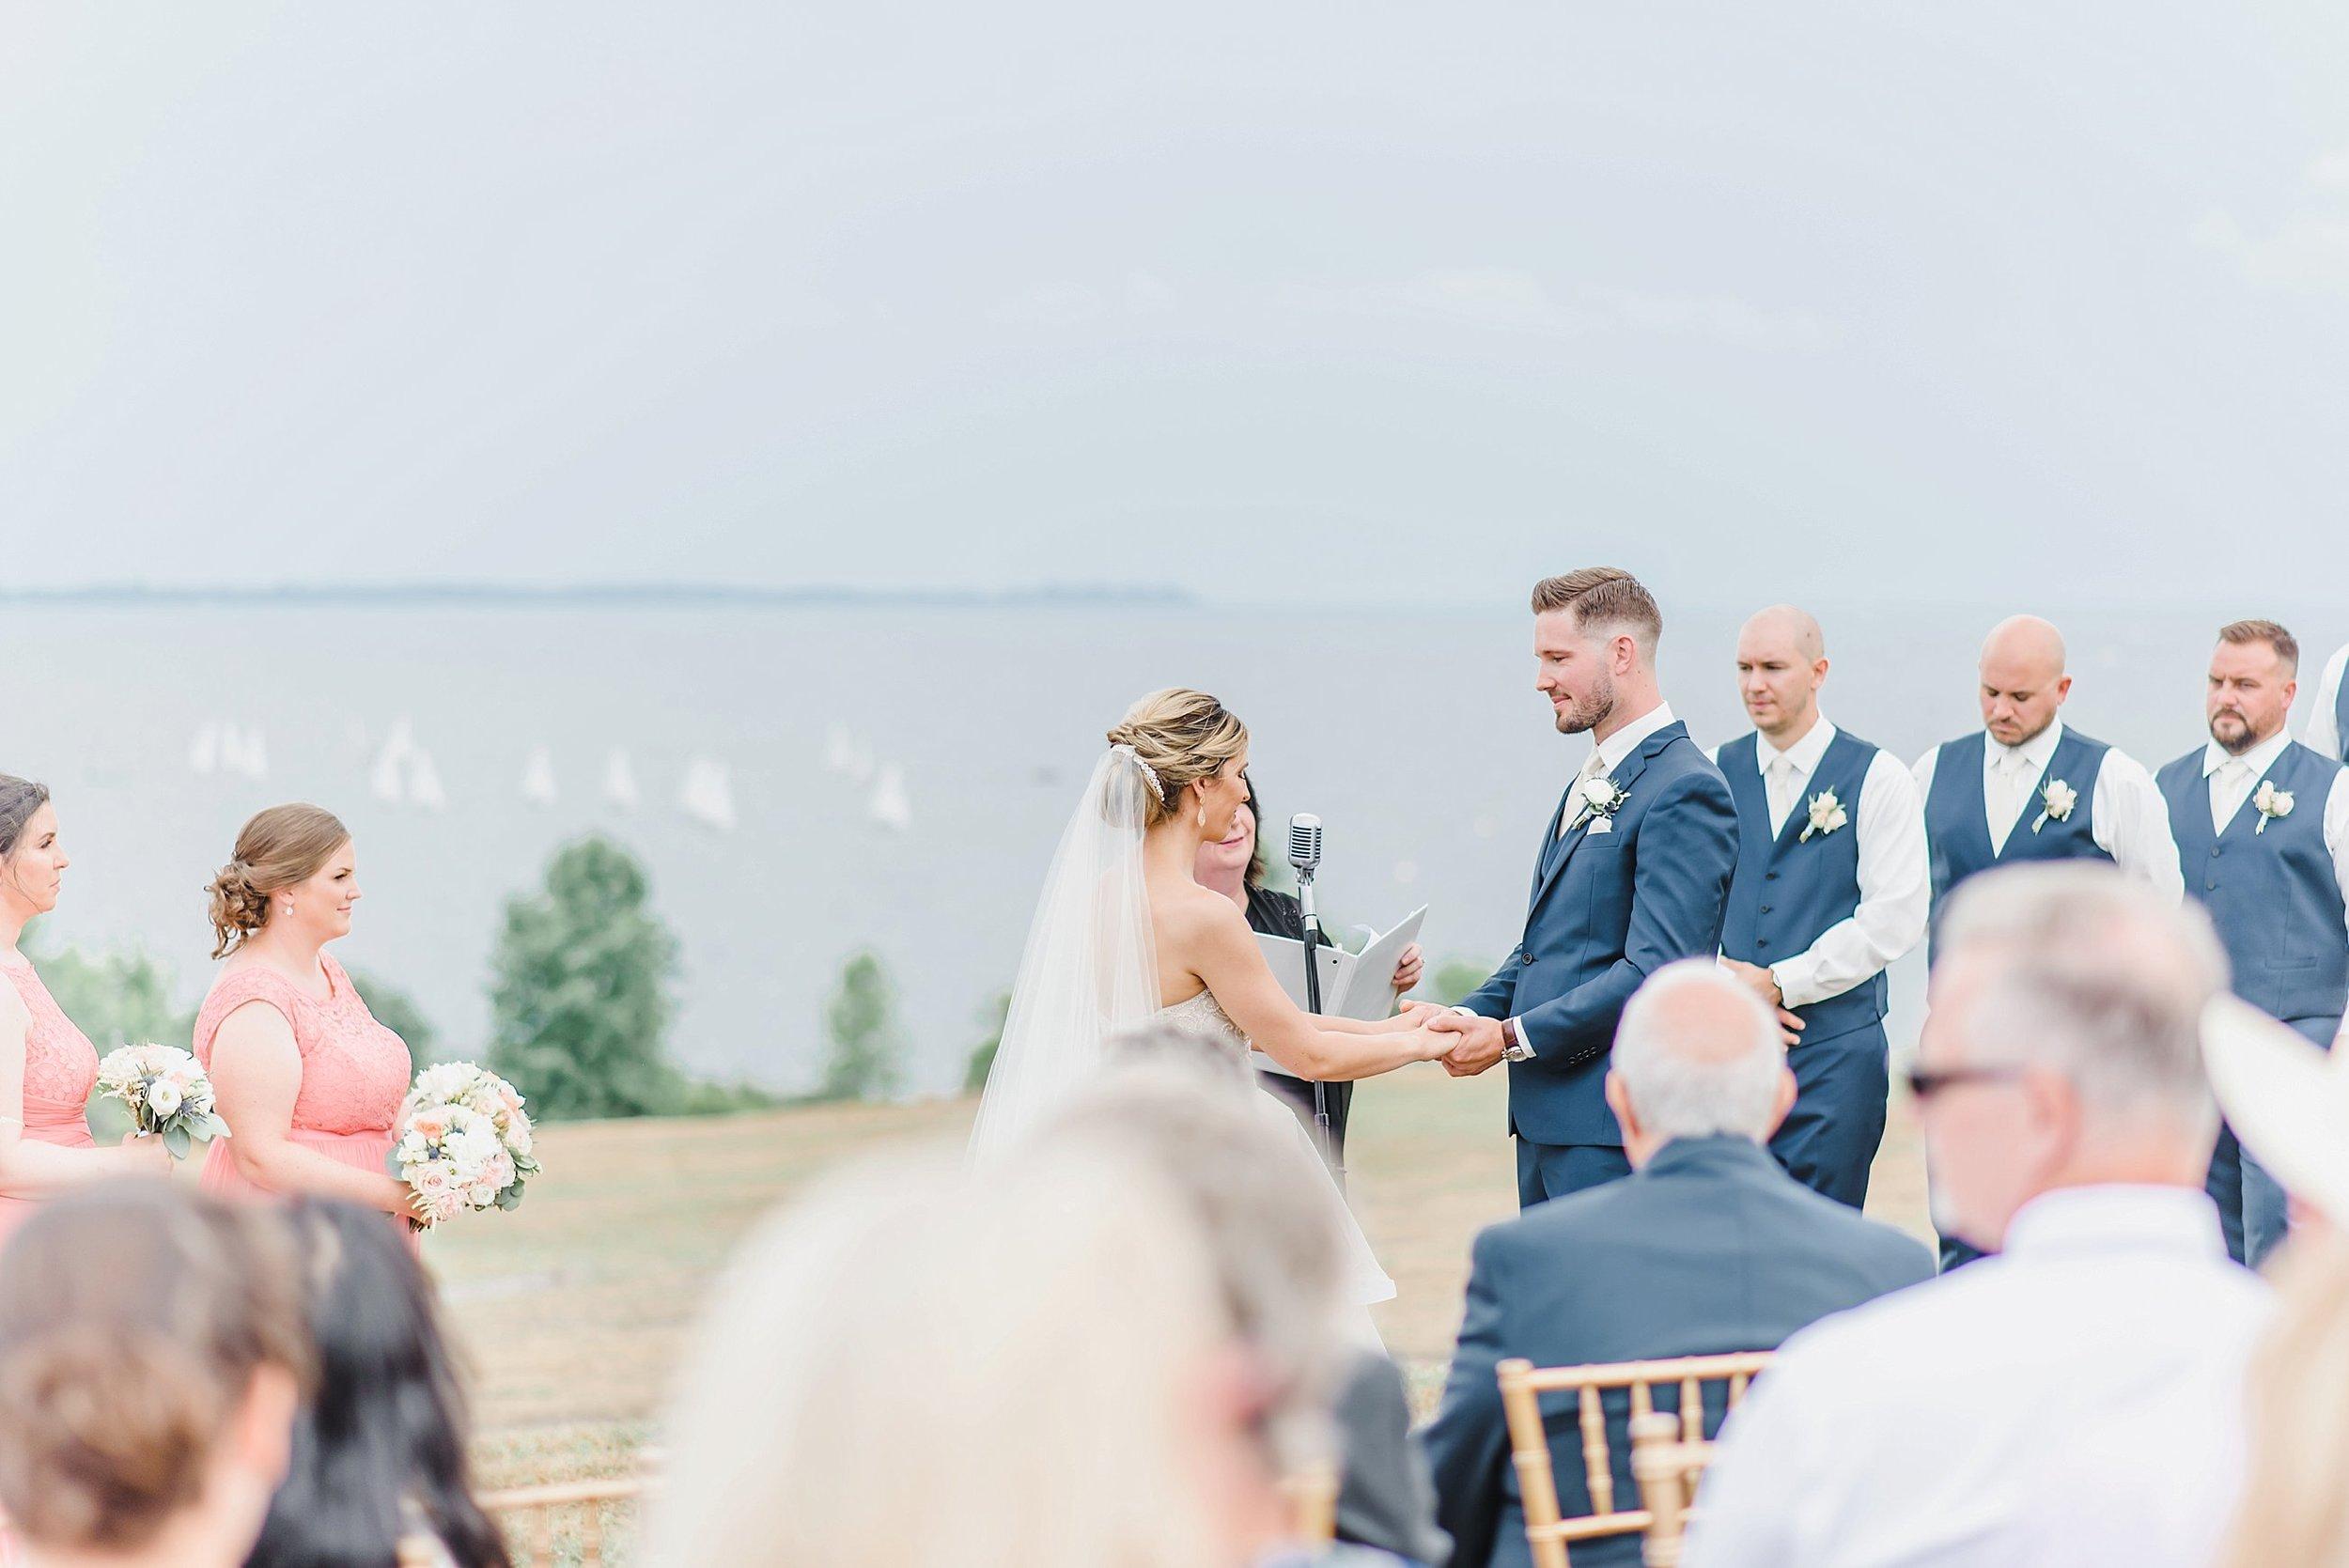 light airy indie fine art ottawa wedding photographer | Ali and Batoul Photography_0186.jpg